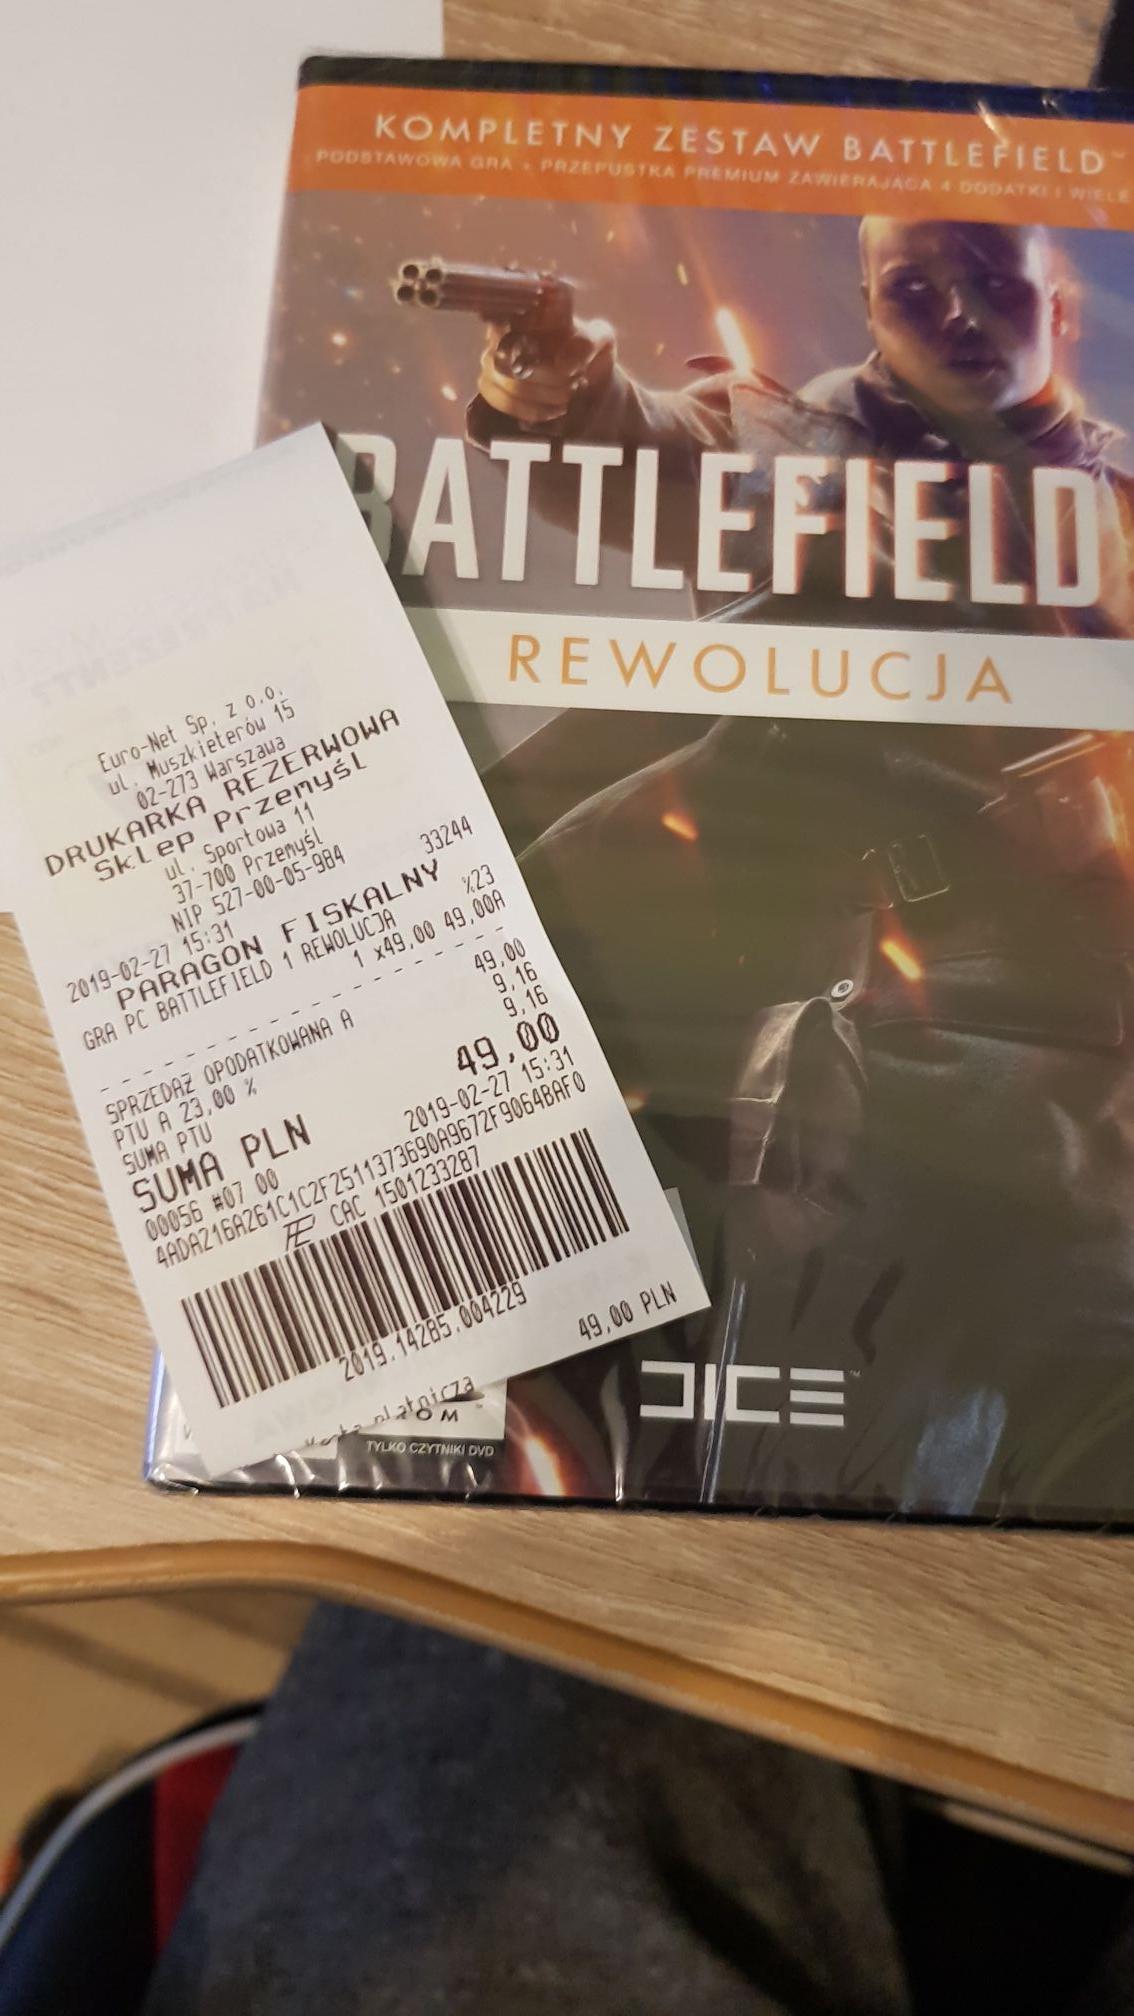 Battlefield 1 Rewolucja -PC  Euro AGD